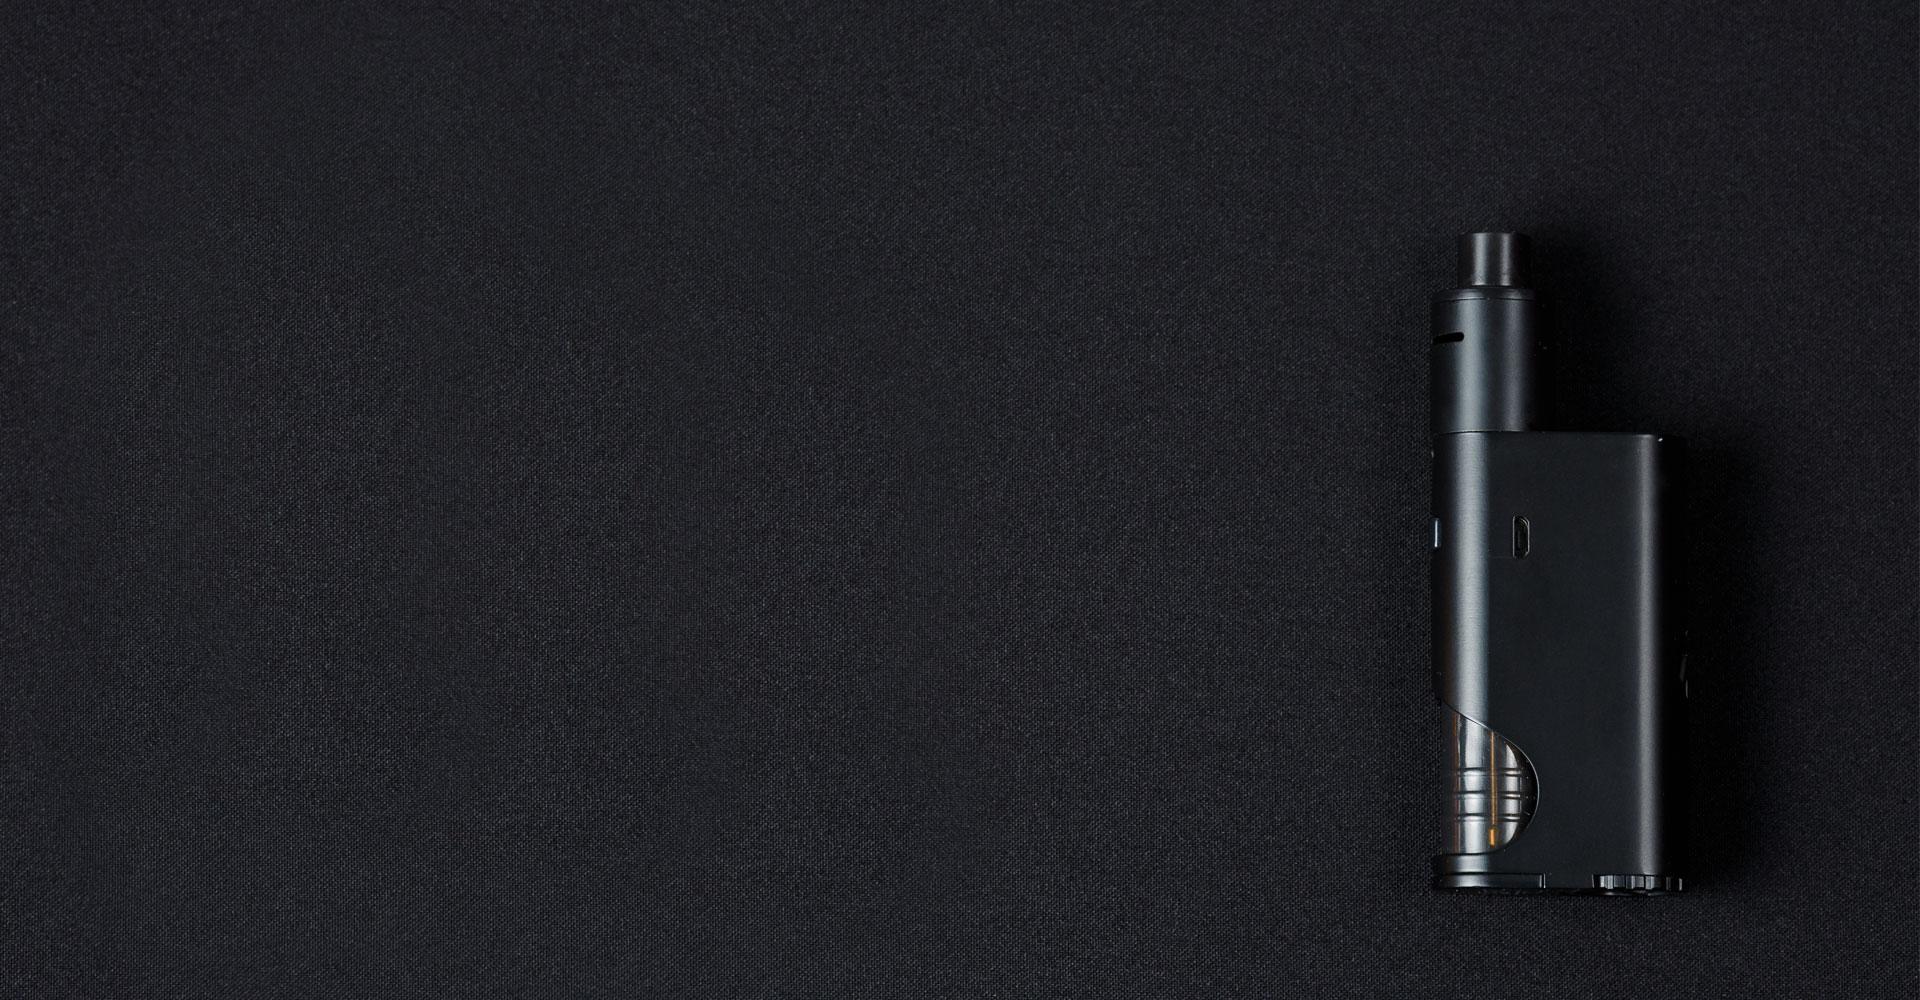 Les E-cigarettes connaissent une popularite inouie